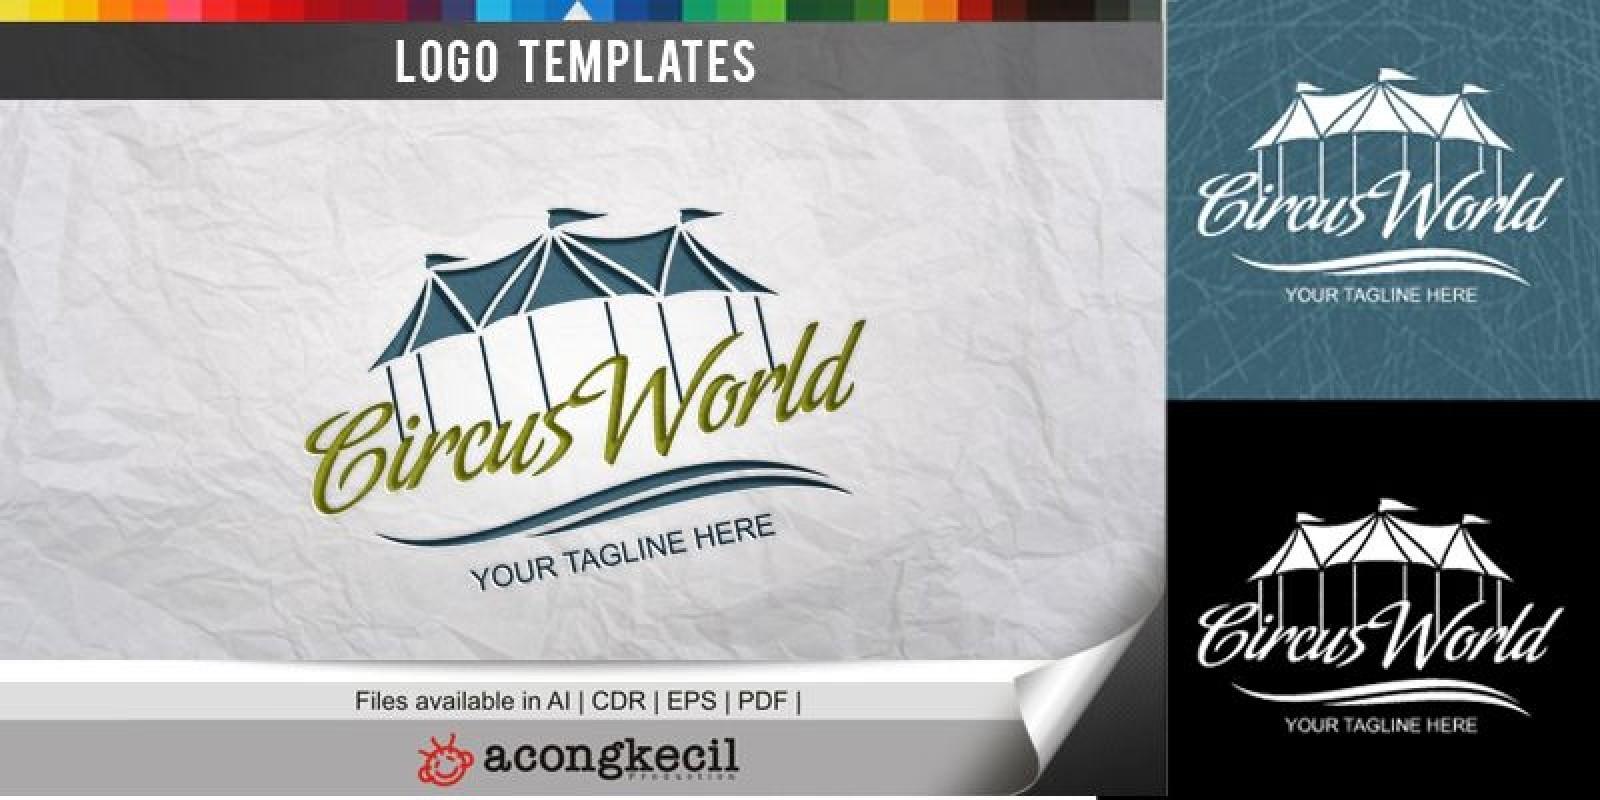 Circus World - Logo Template